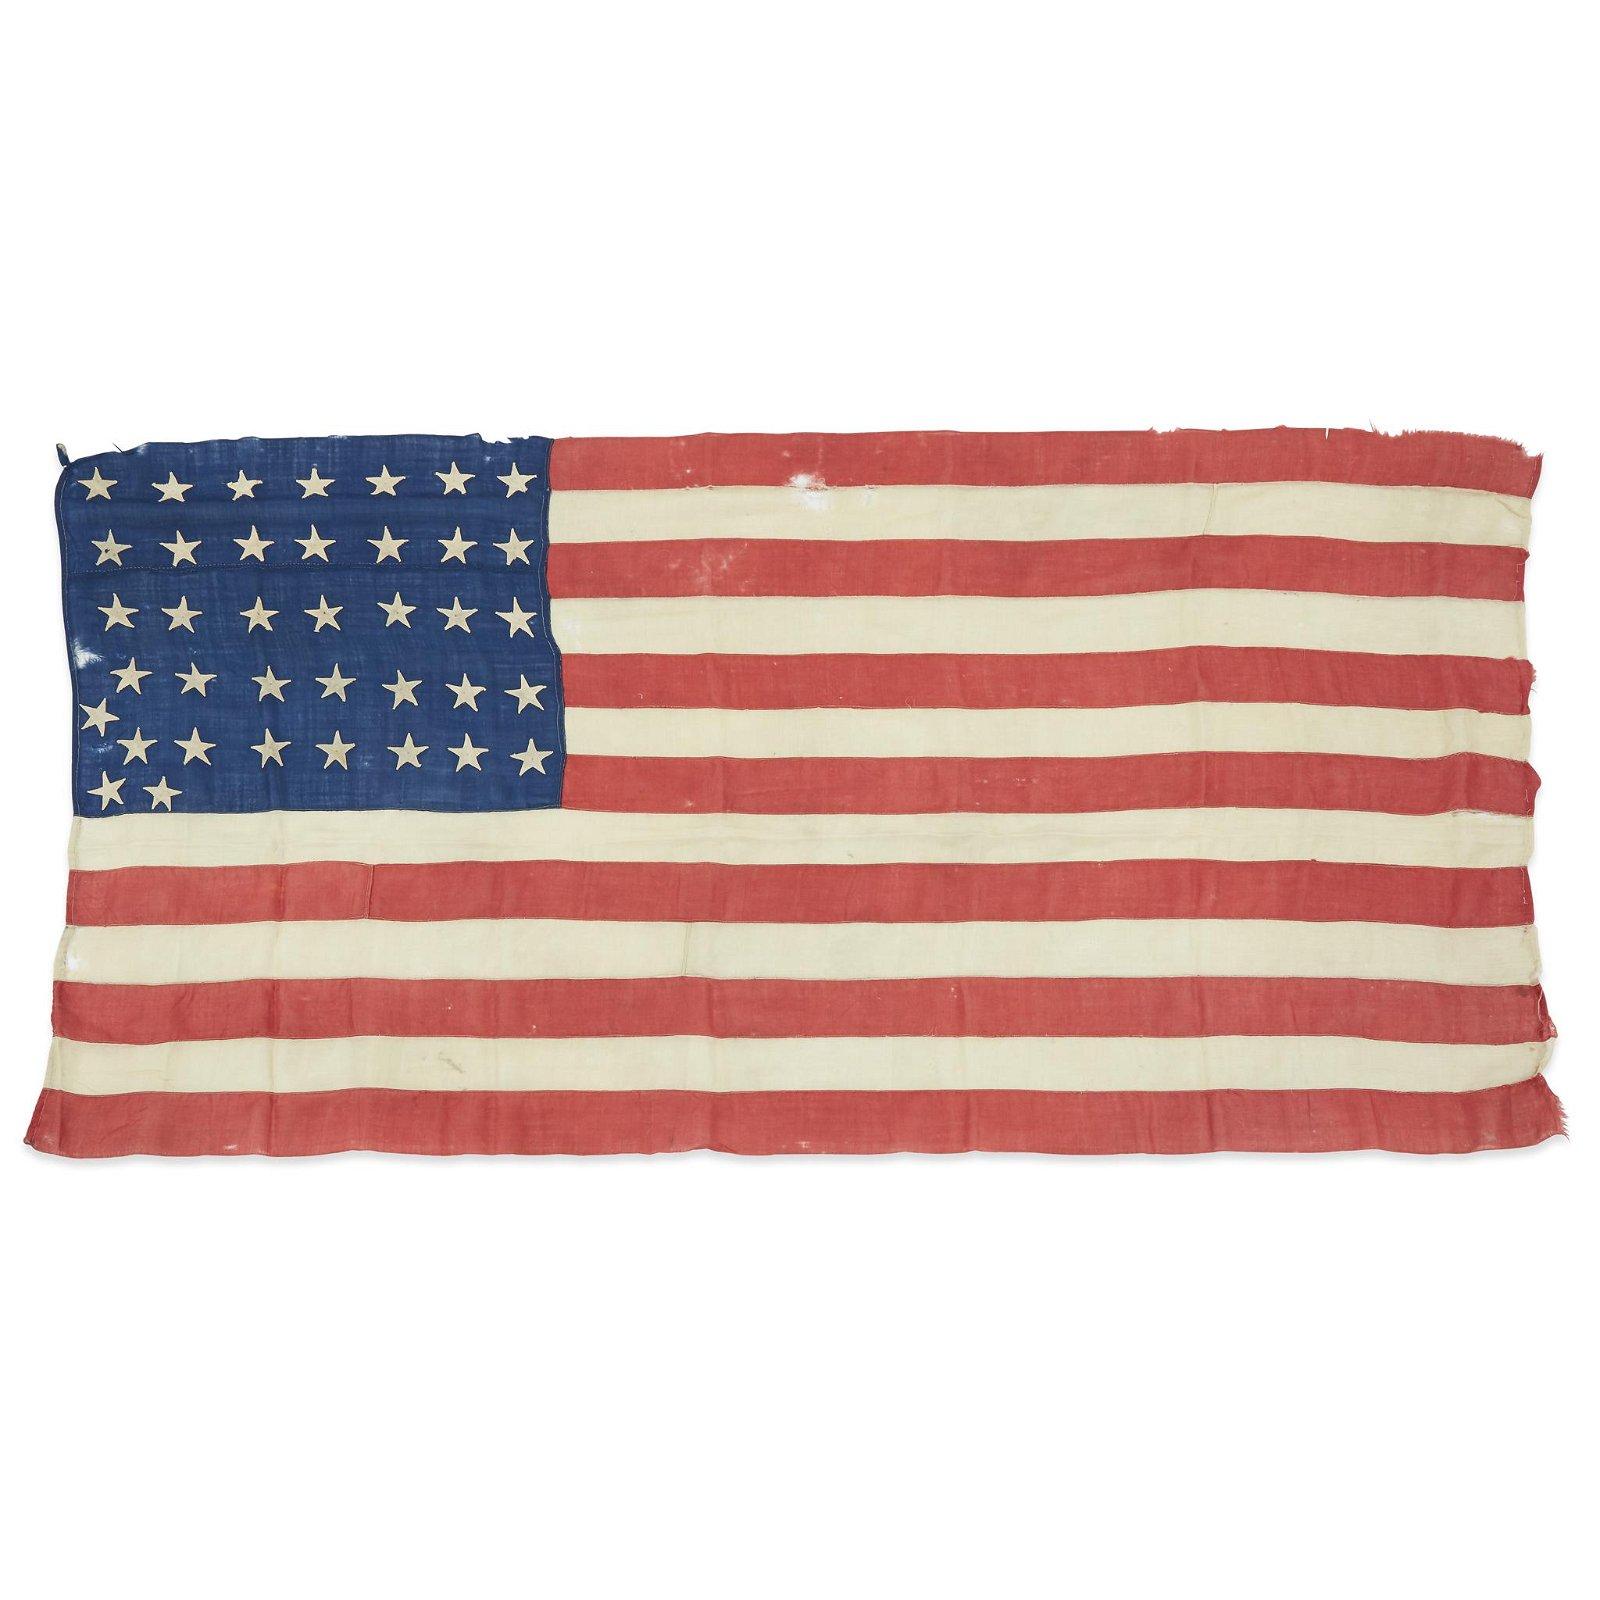 A Civil War era 35-Star American Flag commemorating